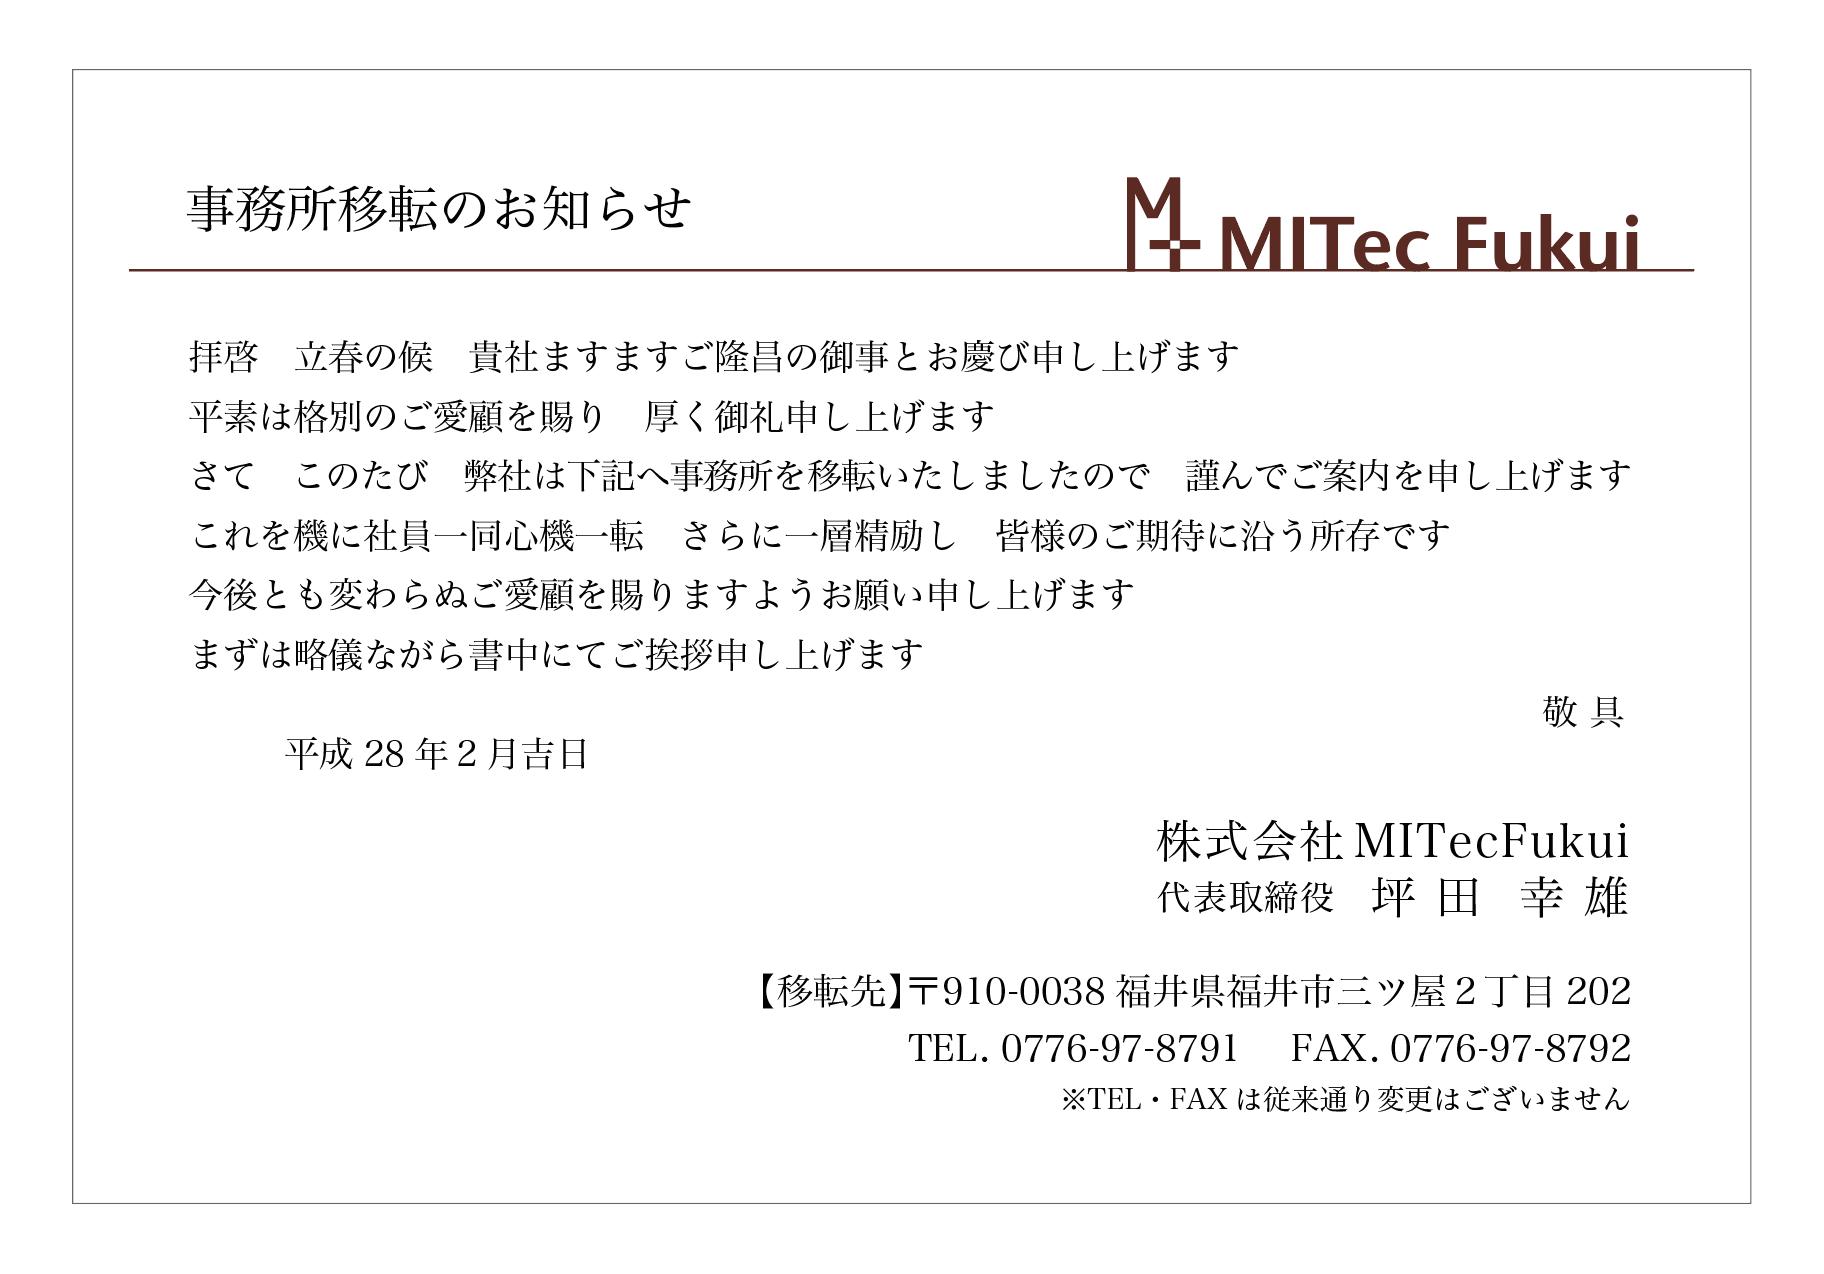 201602MITecFukui事務所移転ご案内